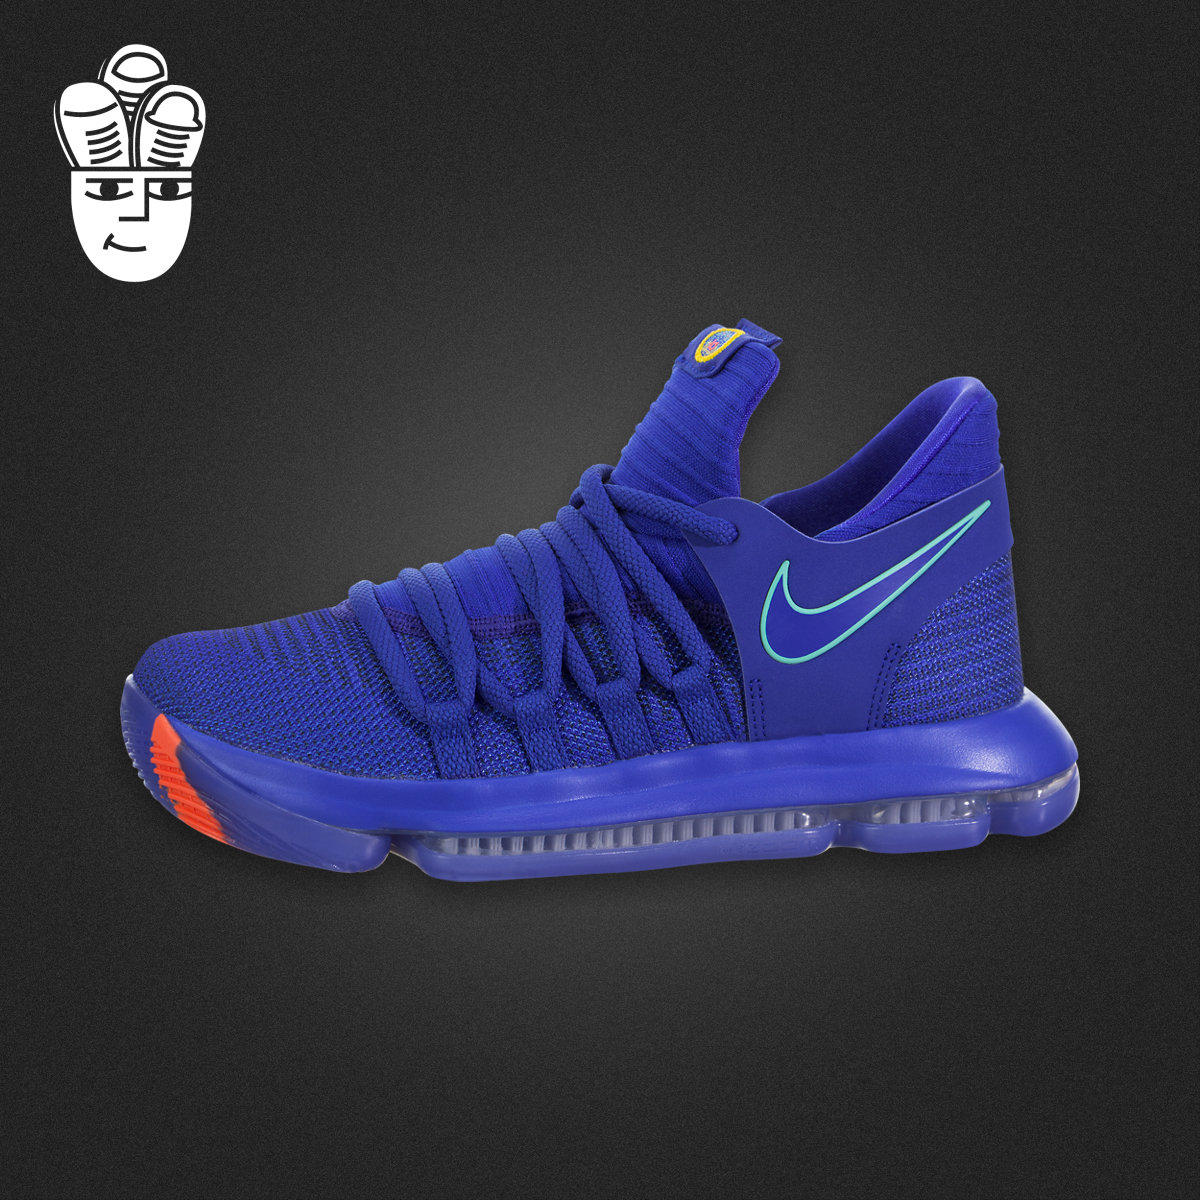 Nike Zoom KD10 耐克男鞋女鞋GS 杜兰特10代战靴 实战篮球鞋